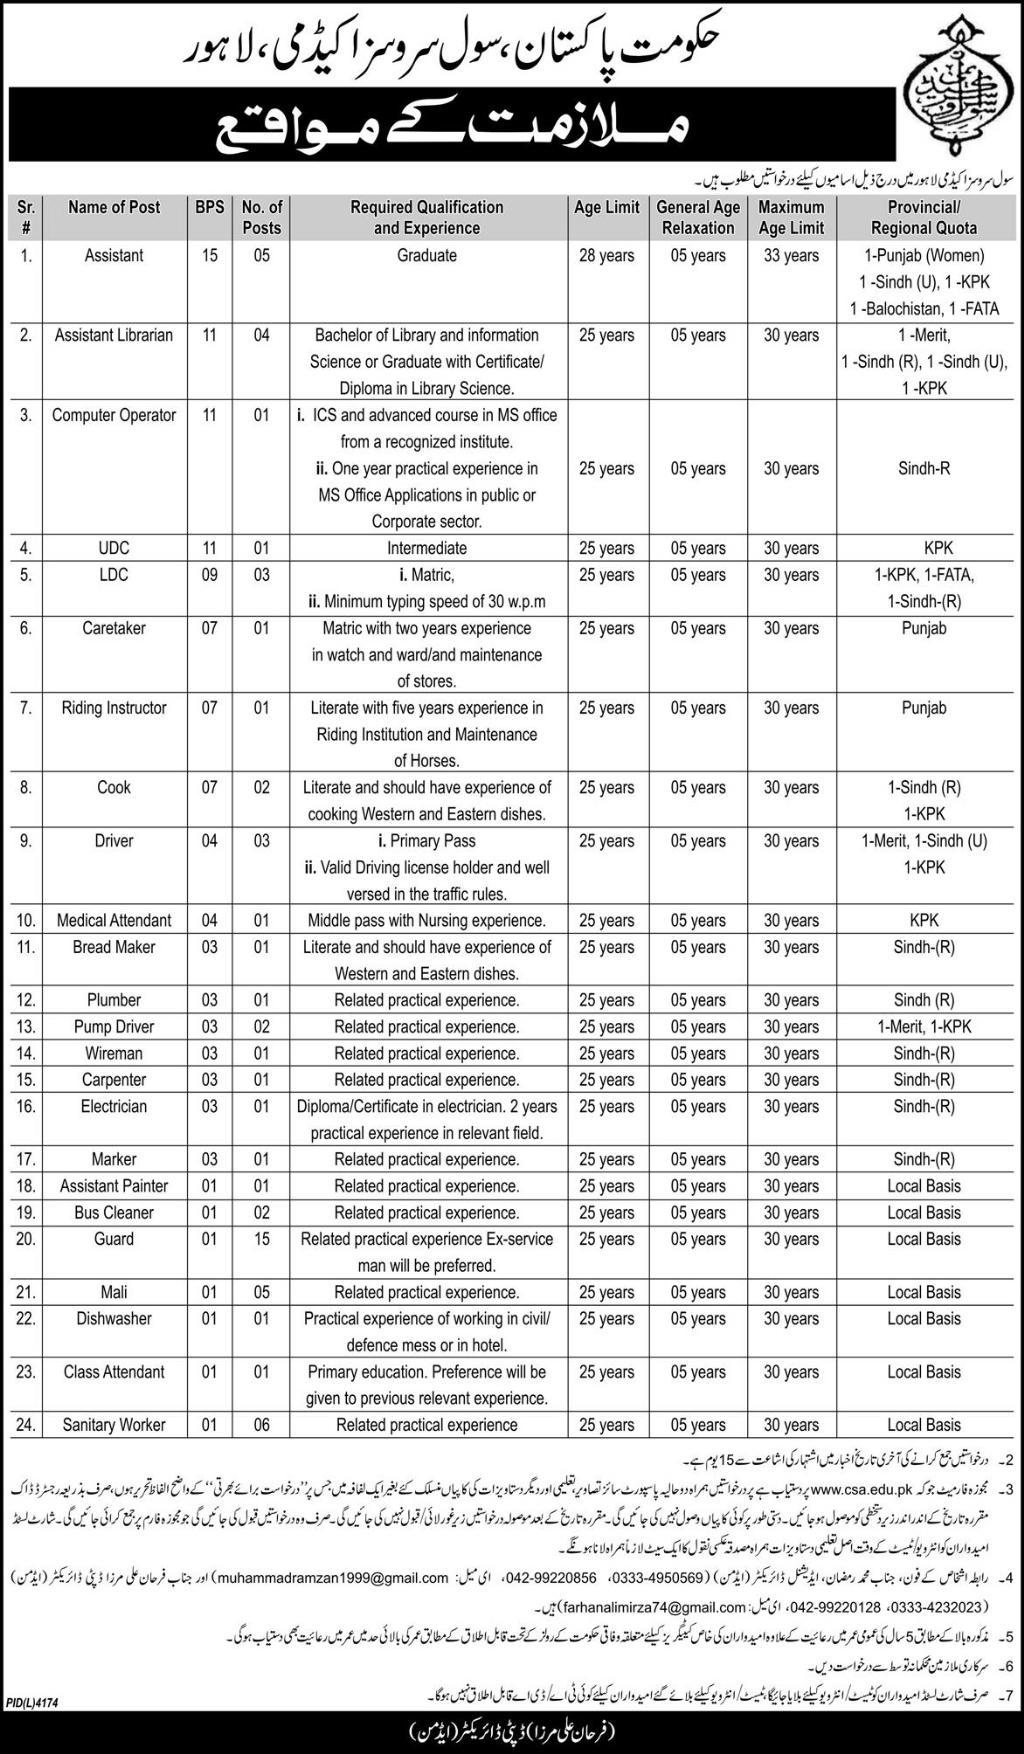 civil service academy government of pakistan jobs 2019 job